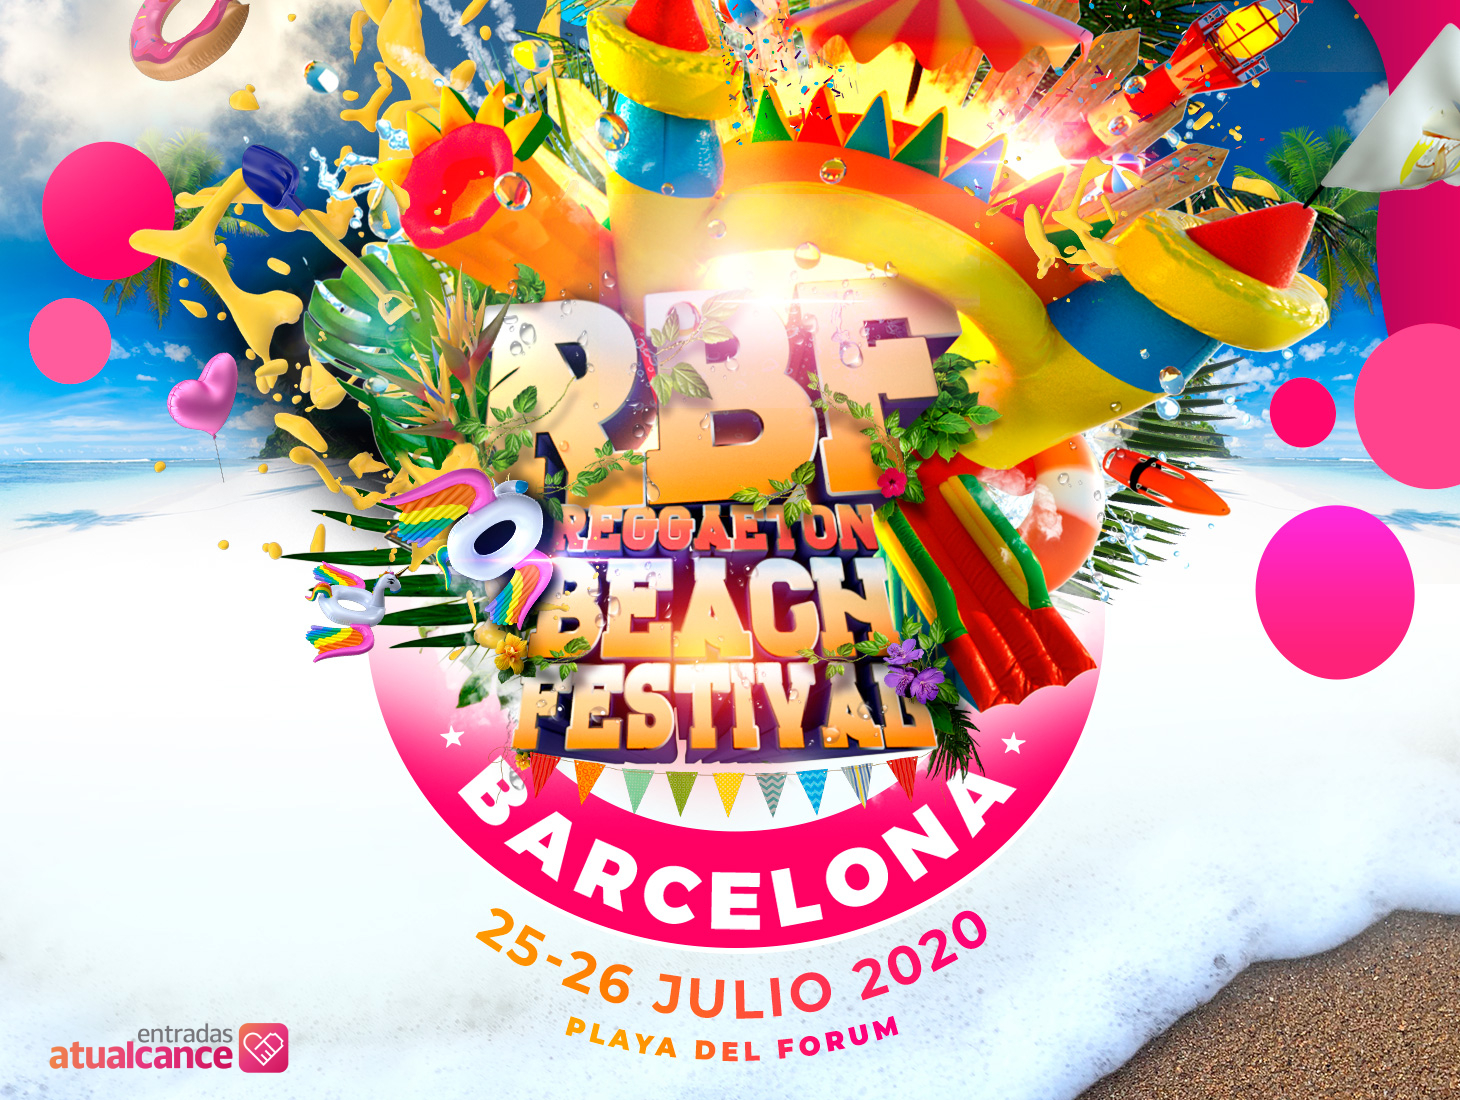 mesas-vip-rbf-barcelona-2020-5db979cc2bcd8.jpeg